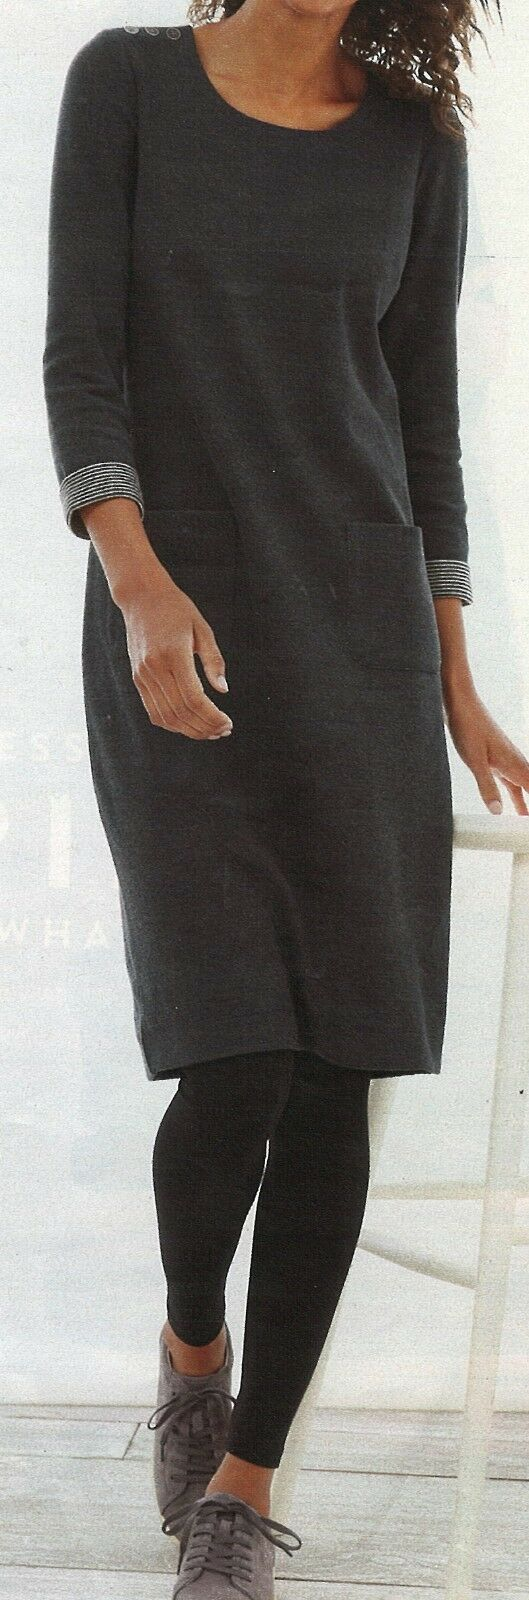 J.Jill DRESS   3X  NWT    Buttoned Shoulder Knit Dress DARK GREY